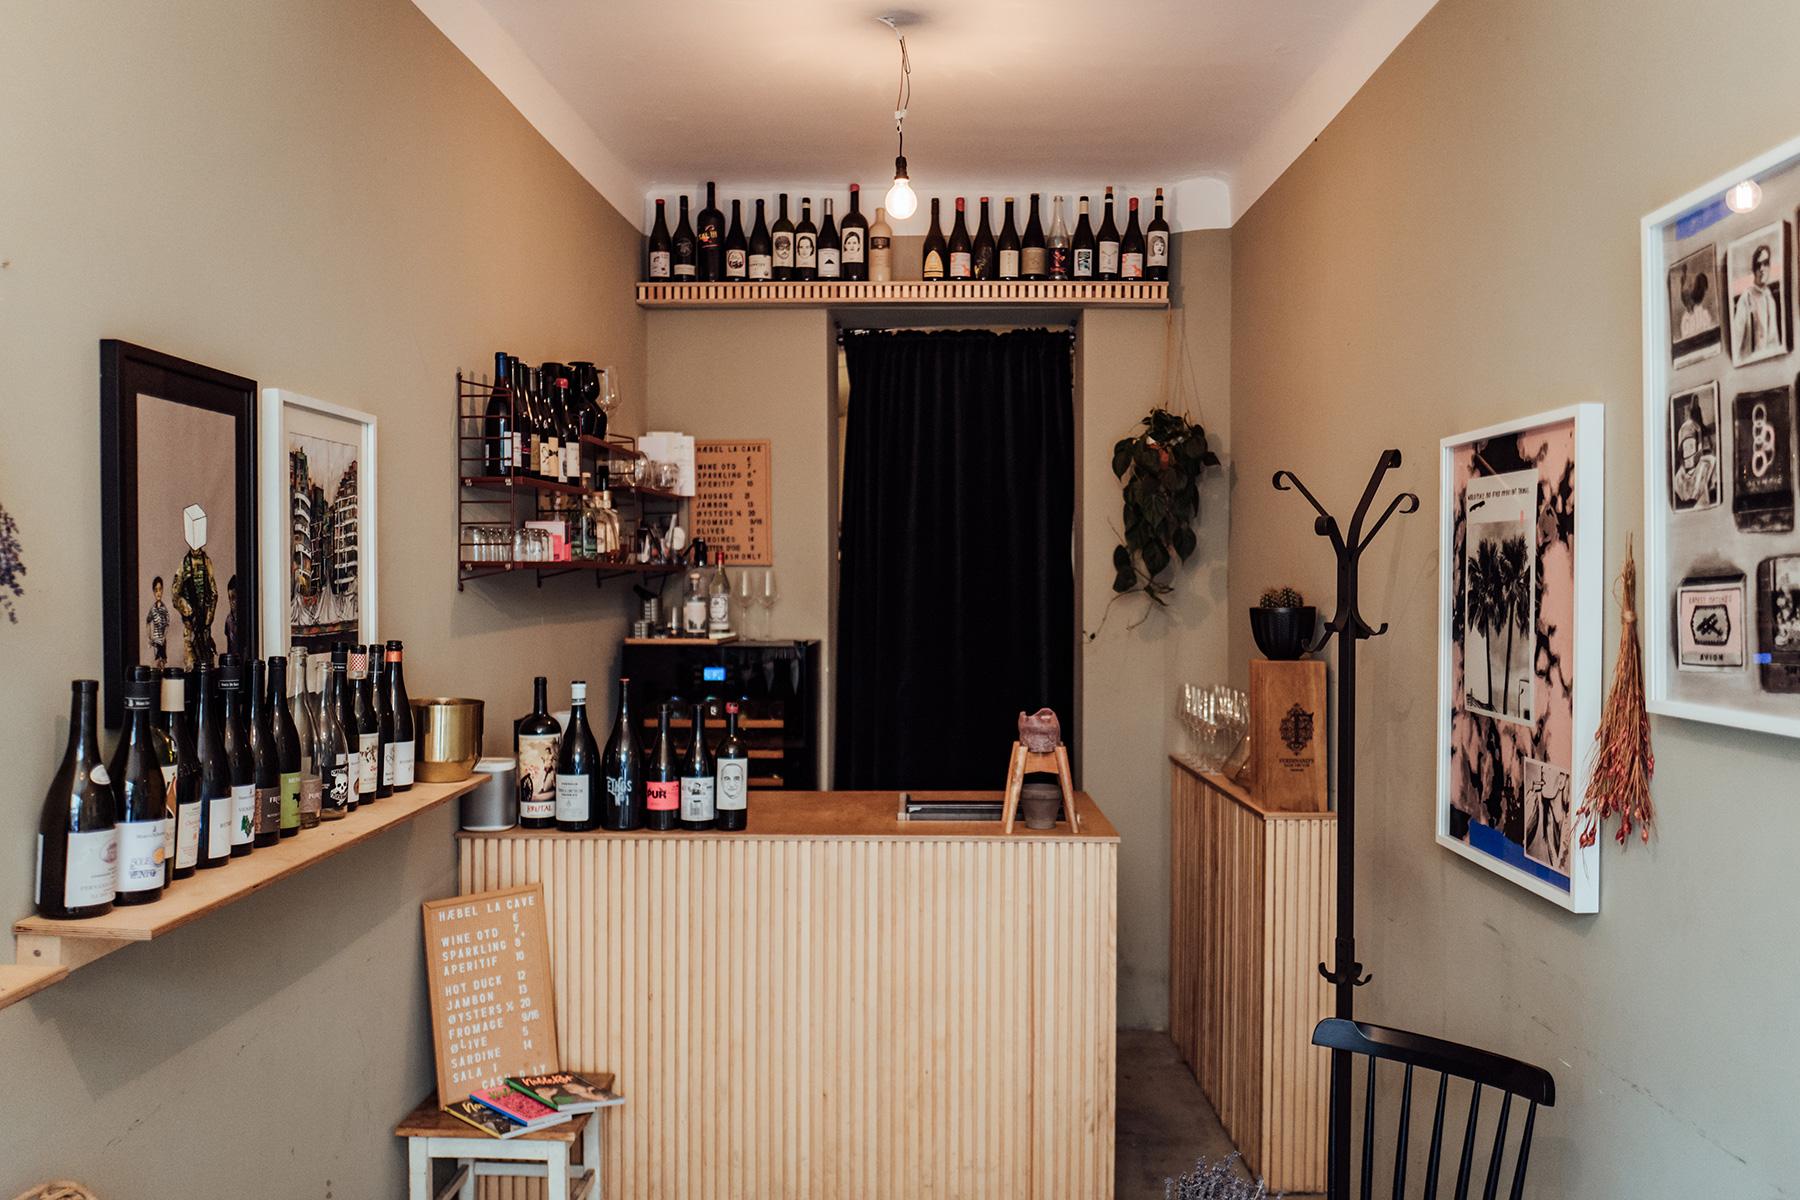 Geheimtipp Hamburg St Pauli Restaurant Haebel Lisa Knauer 15